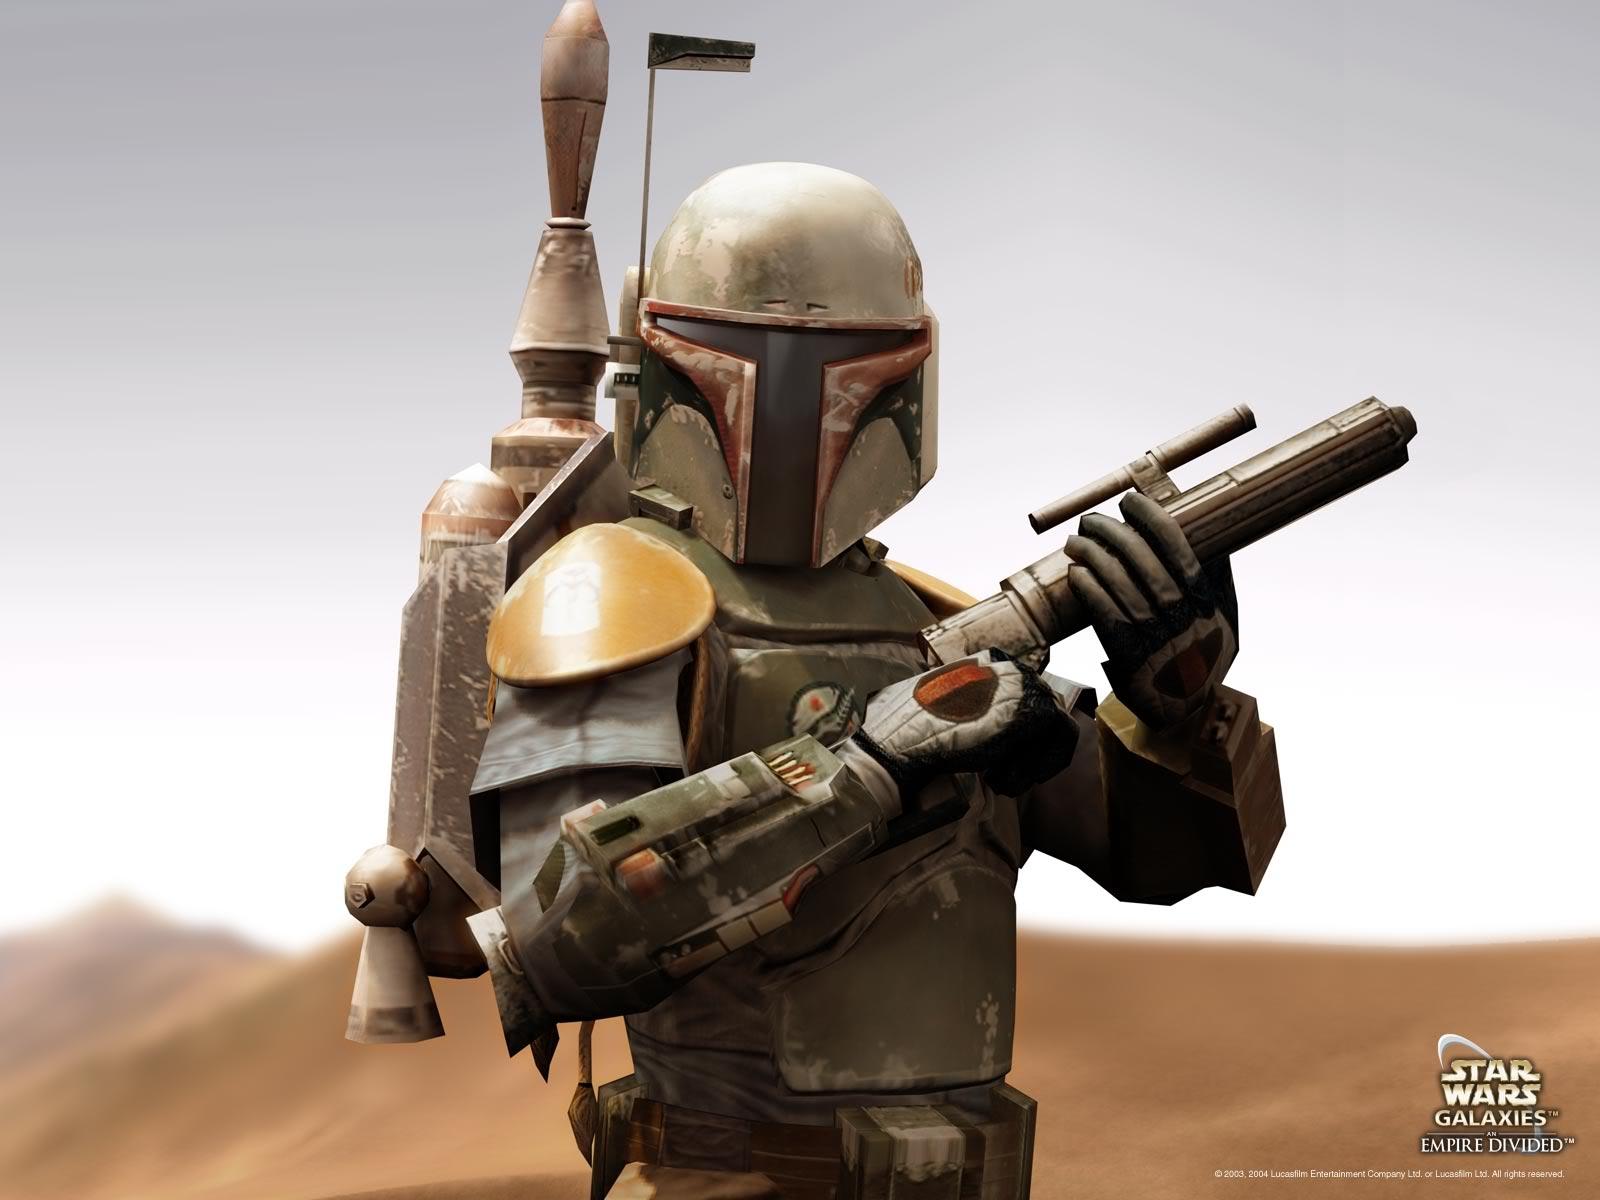 Star Wars : nouvelles rumeurs d'un film Boba Fett